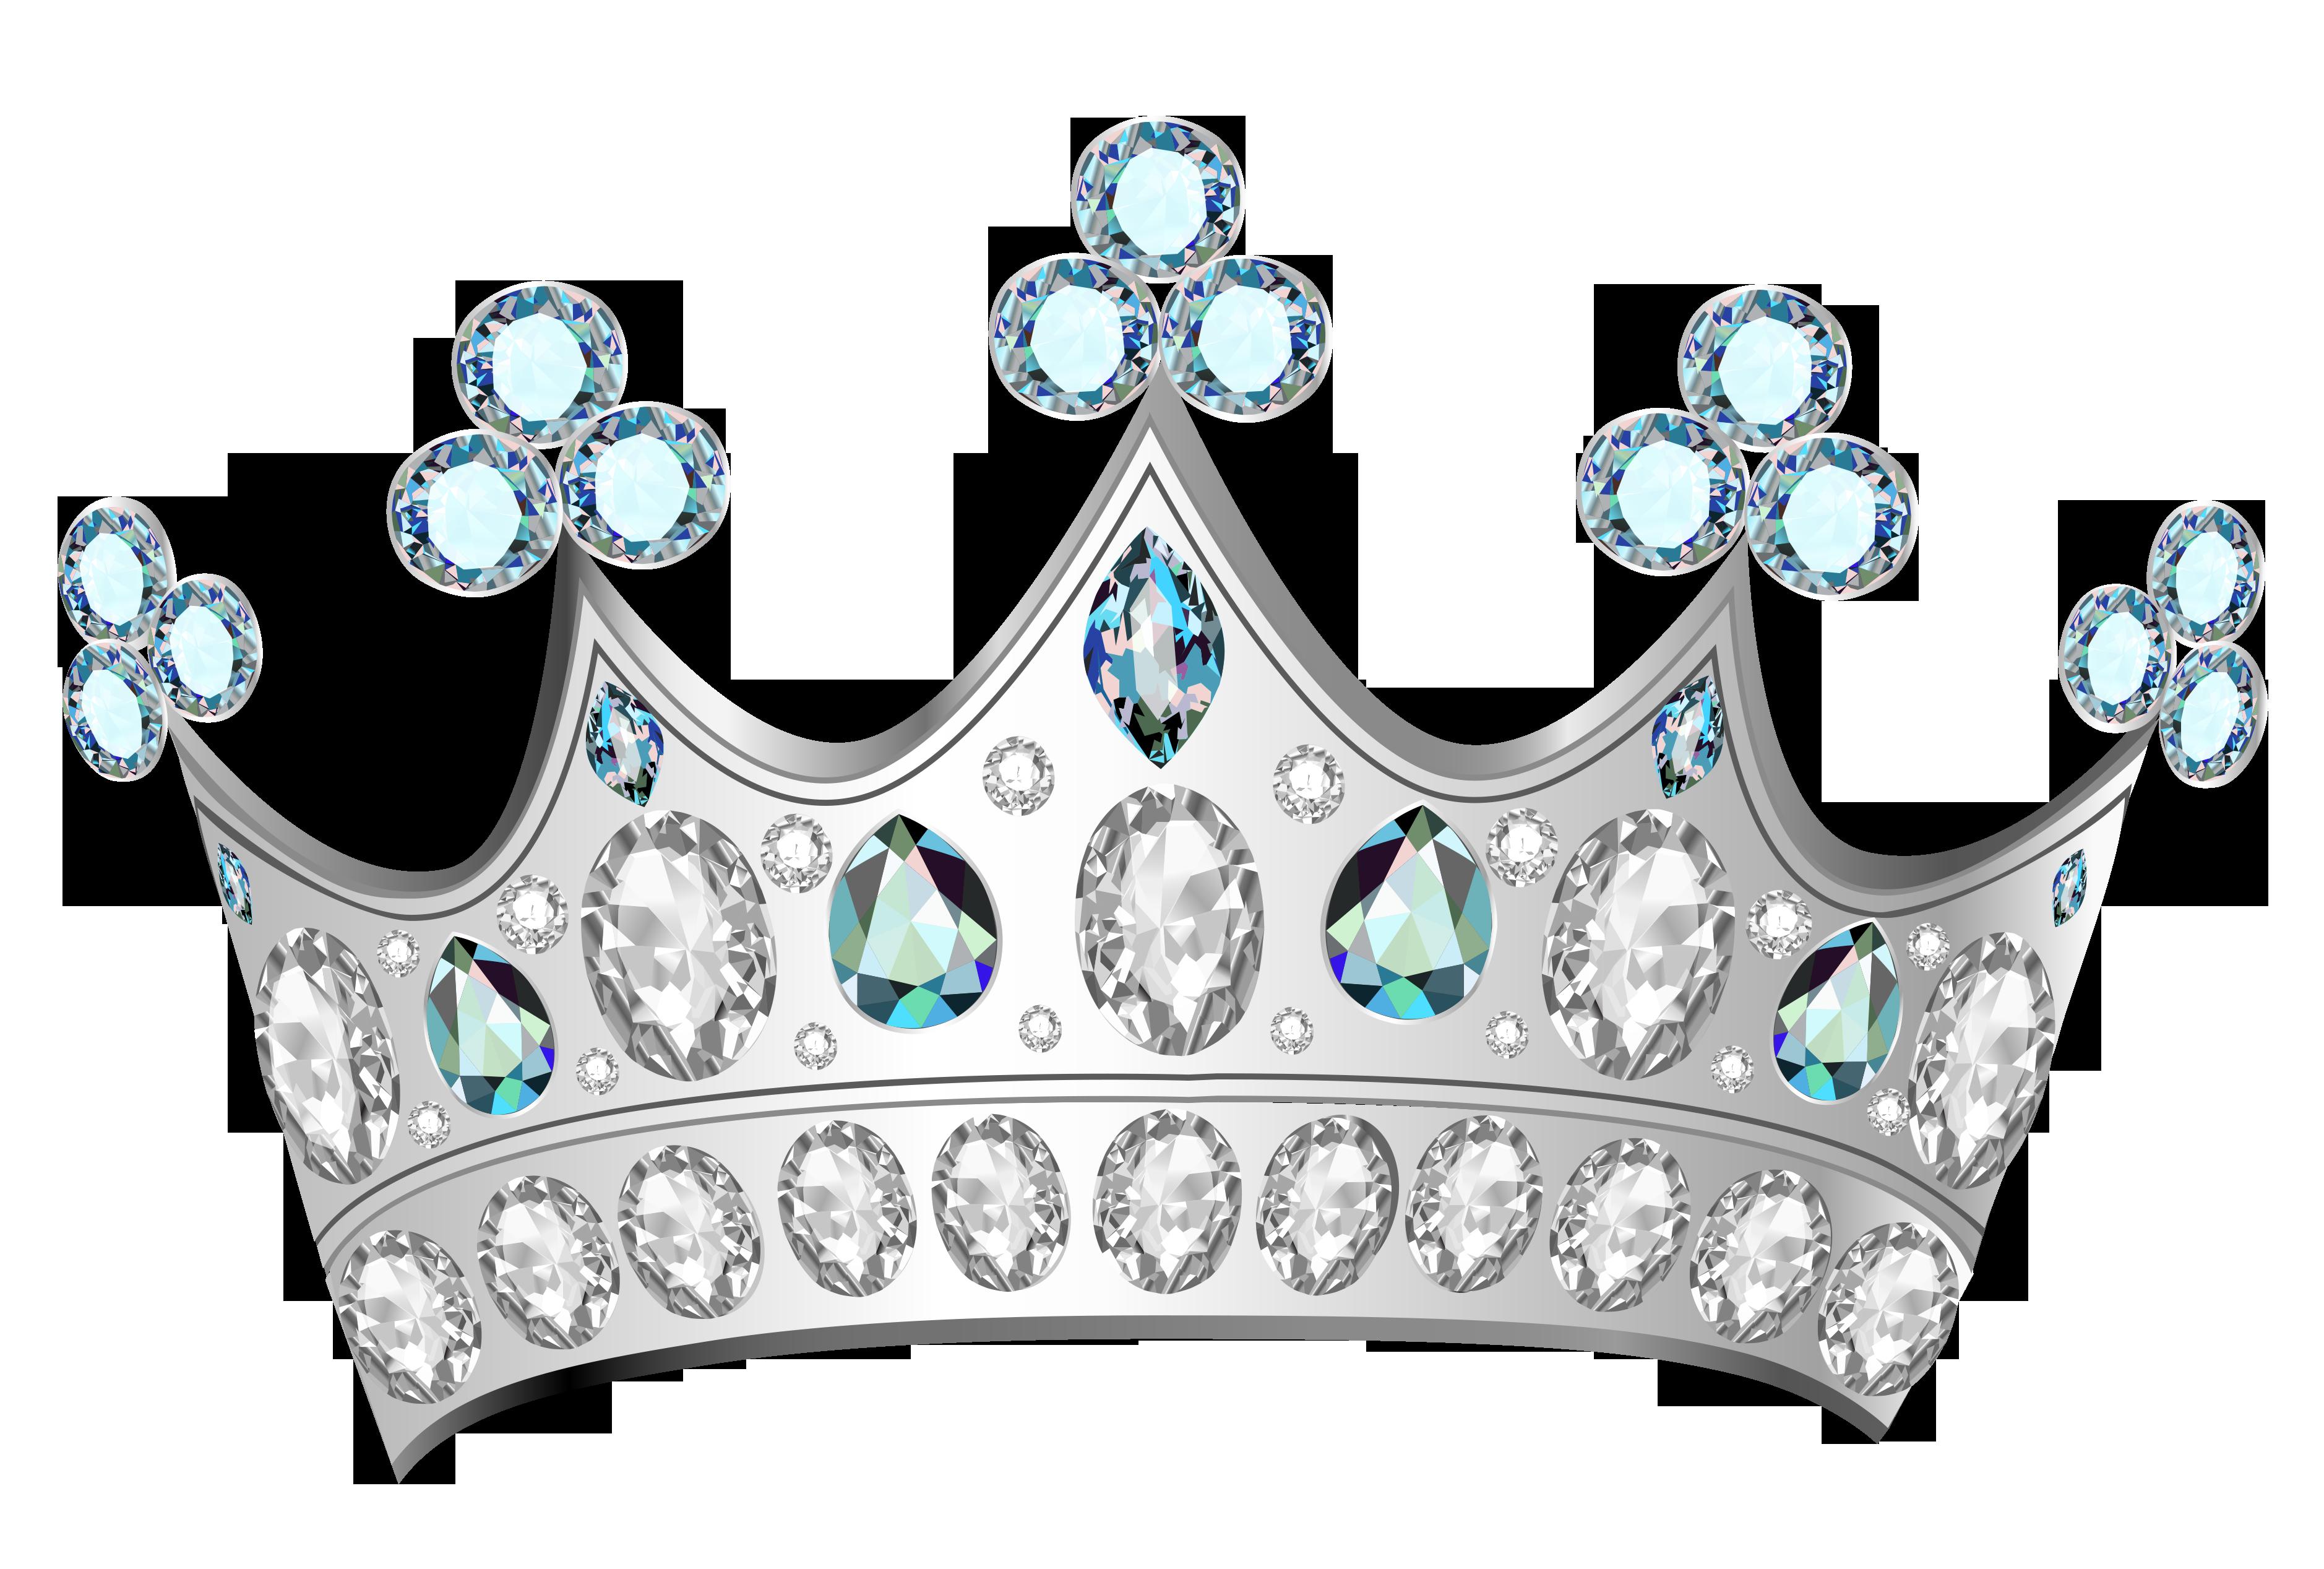 Diamond clipart dimond School print crown 1116 category